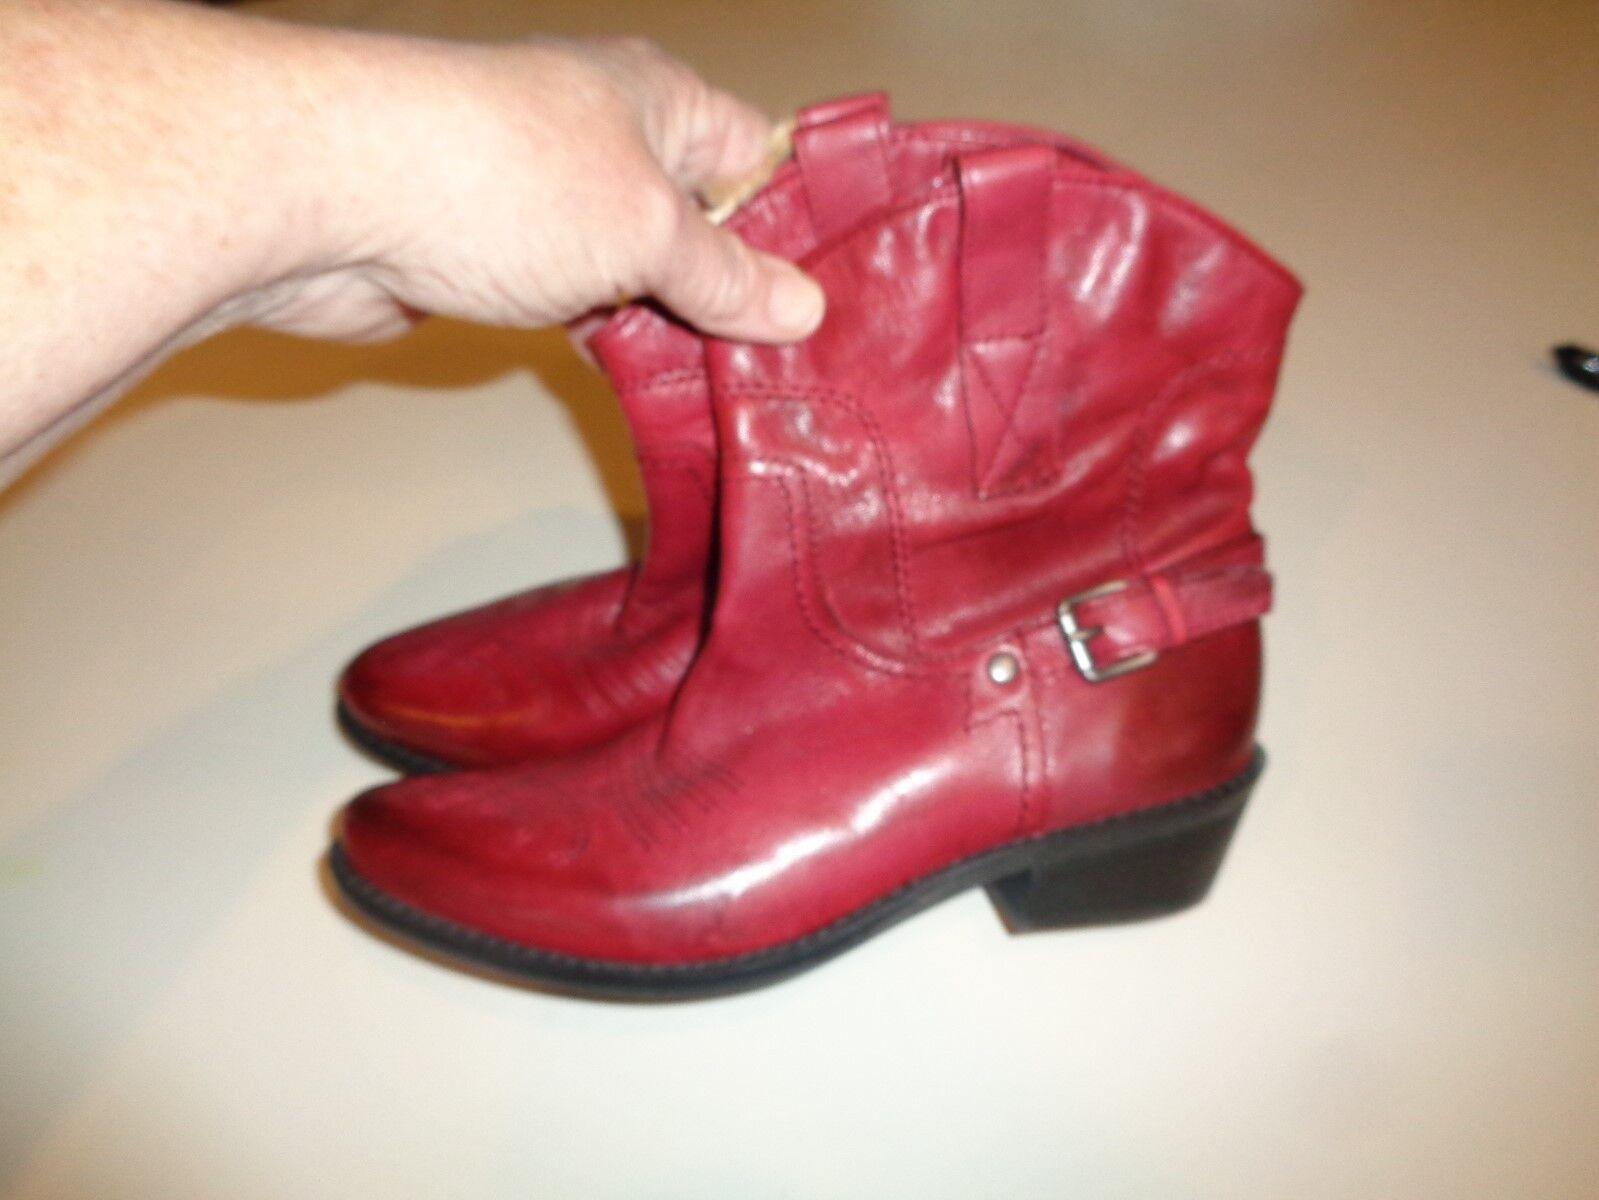 Womens 6 M Franco Sarto 'Waco' Dark Red Ankle Western Cowboy Boots NEW W  TAGS